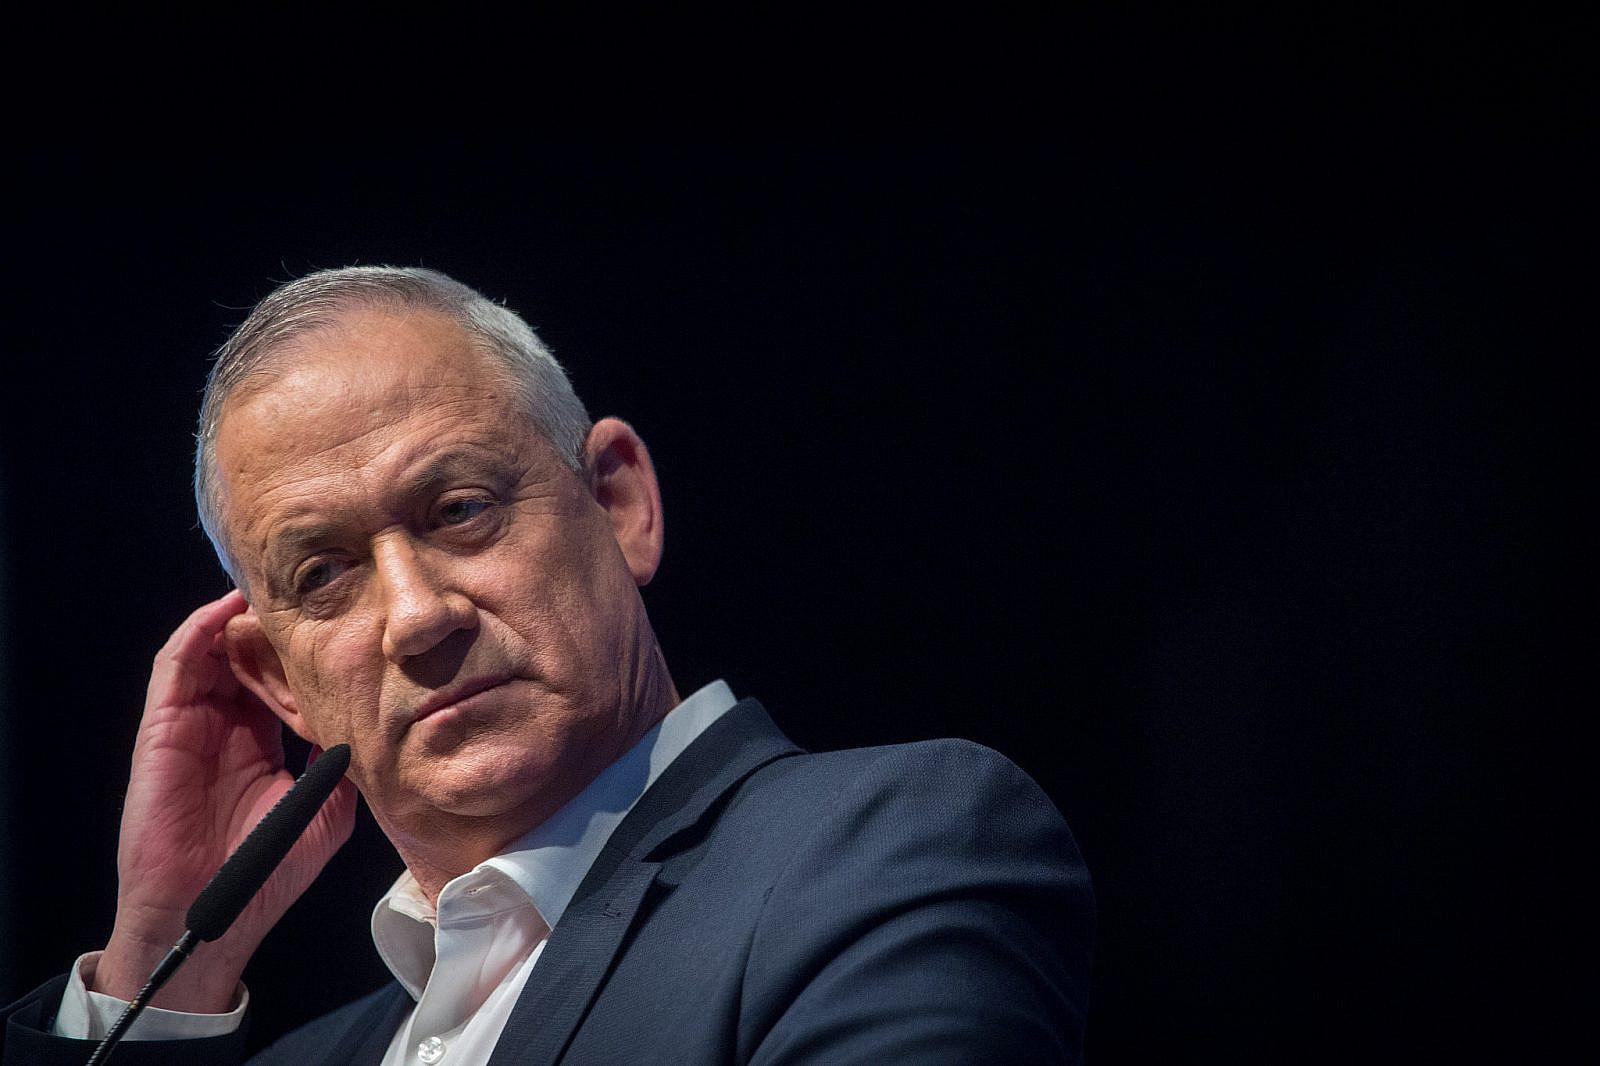 Benjamin Netanyahu on verge of election victory